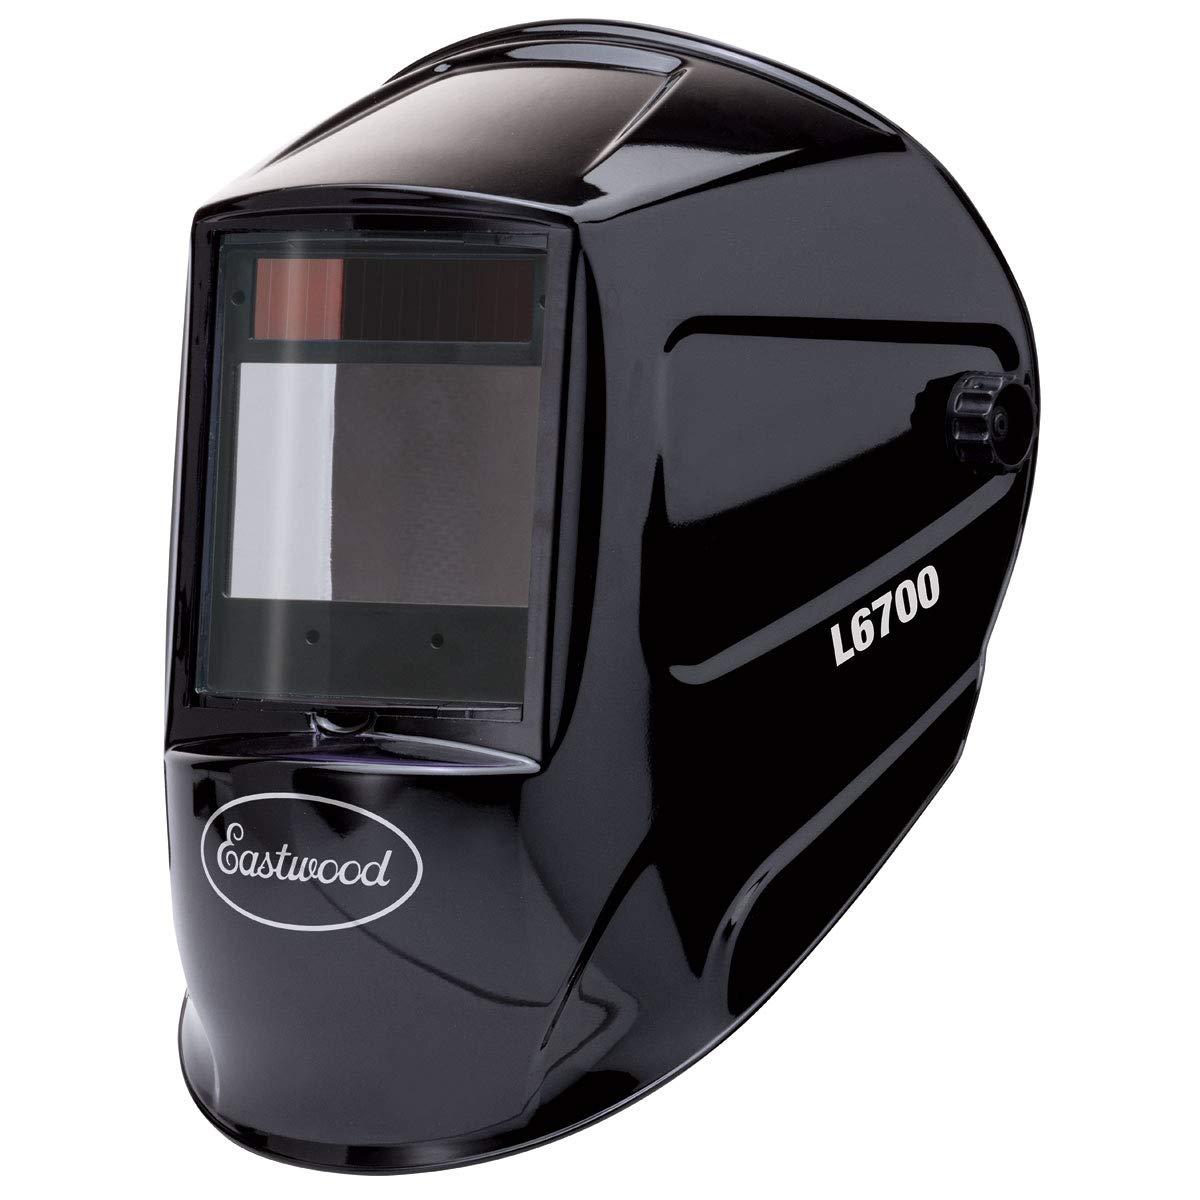 Eastwood Large View Auto Darkening Welding Helmet Mask Adjustable Headband Comfortable - L6700 by Eastwood